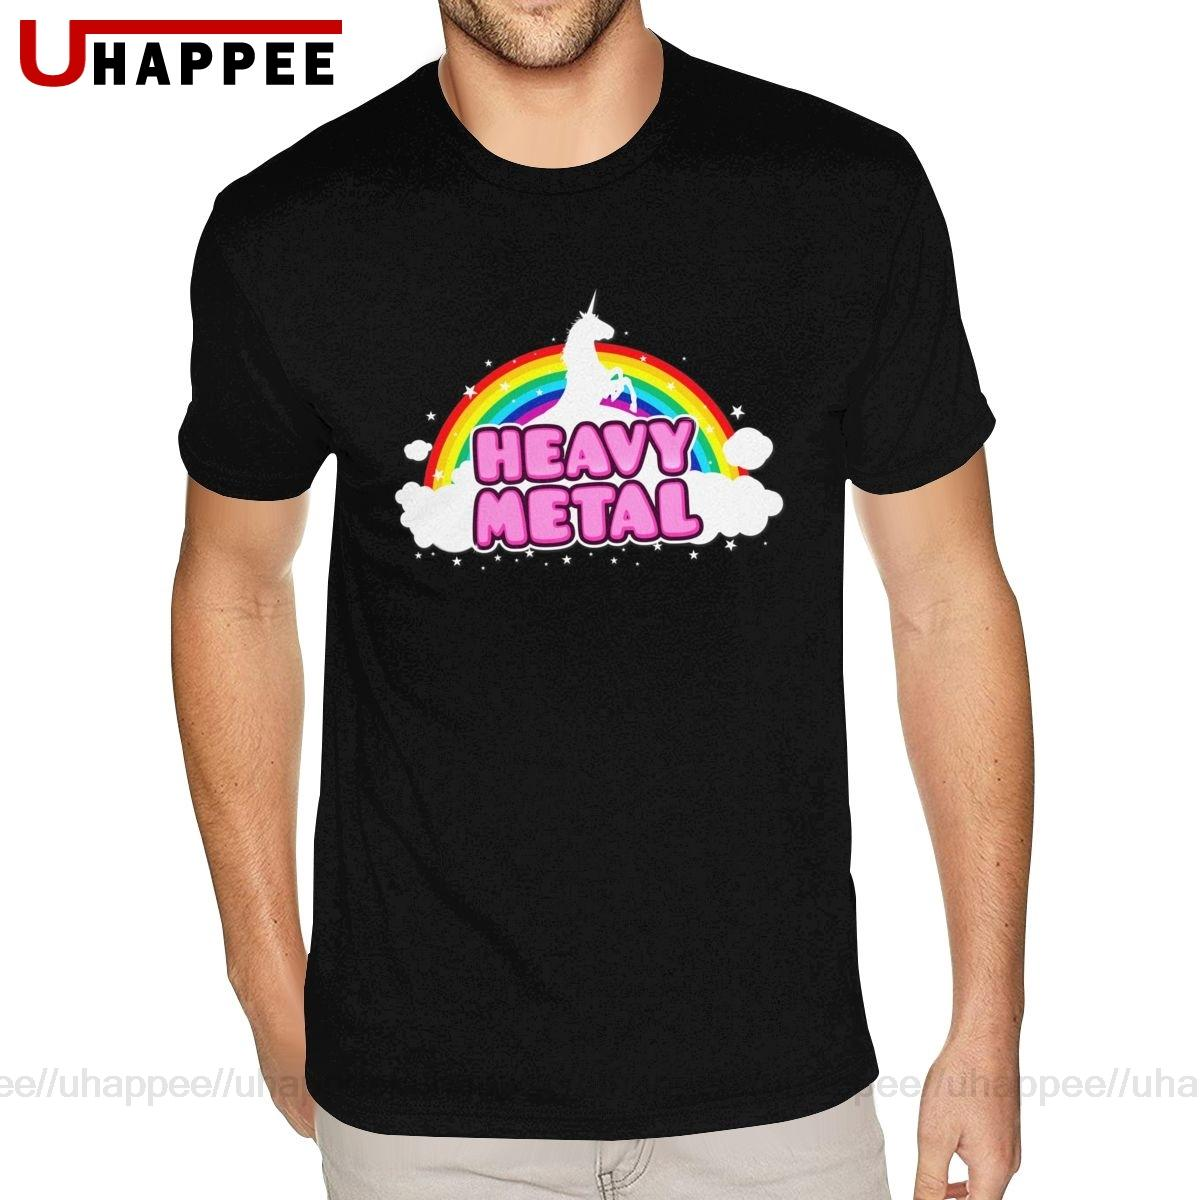 Tees Shirt Unicorn Short-Sleeves Heavy Metal Plus-Size Mens Ultra-Cotton O-Neck Wholesale